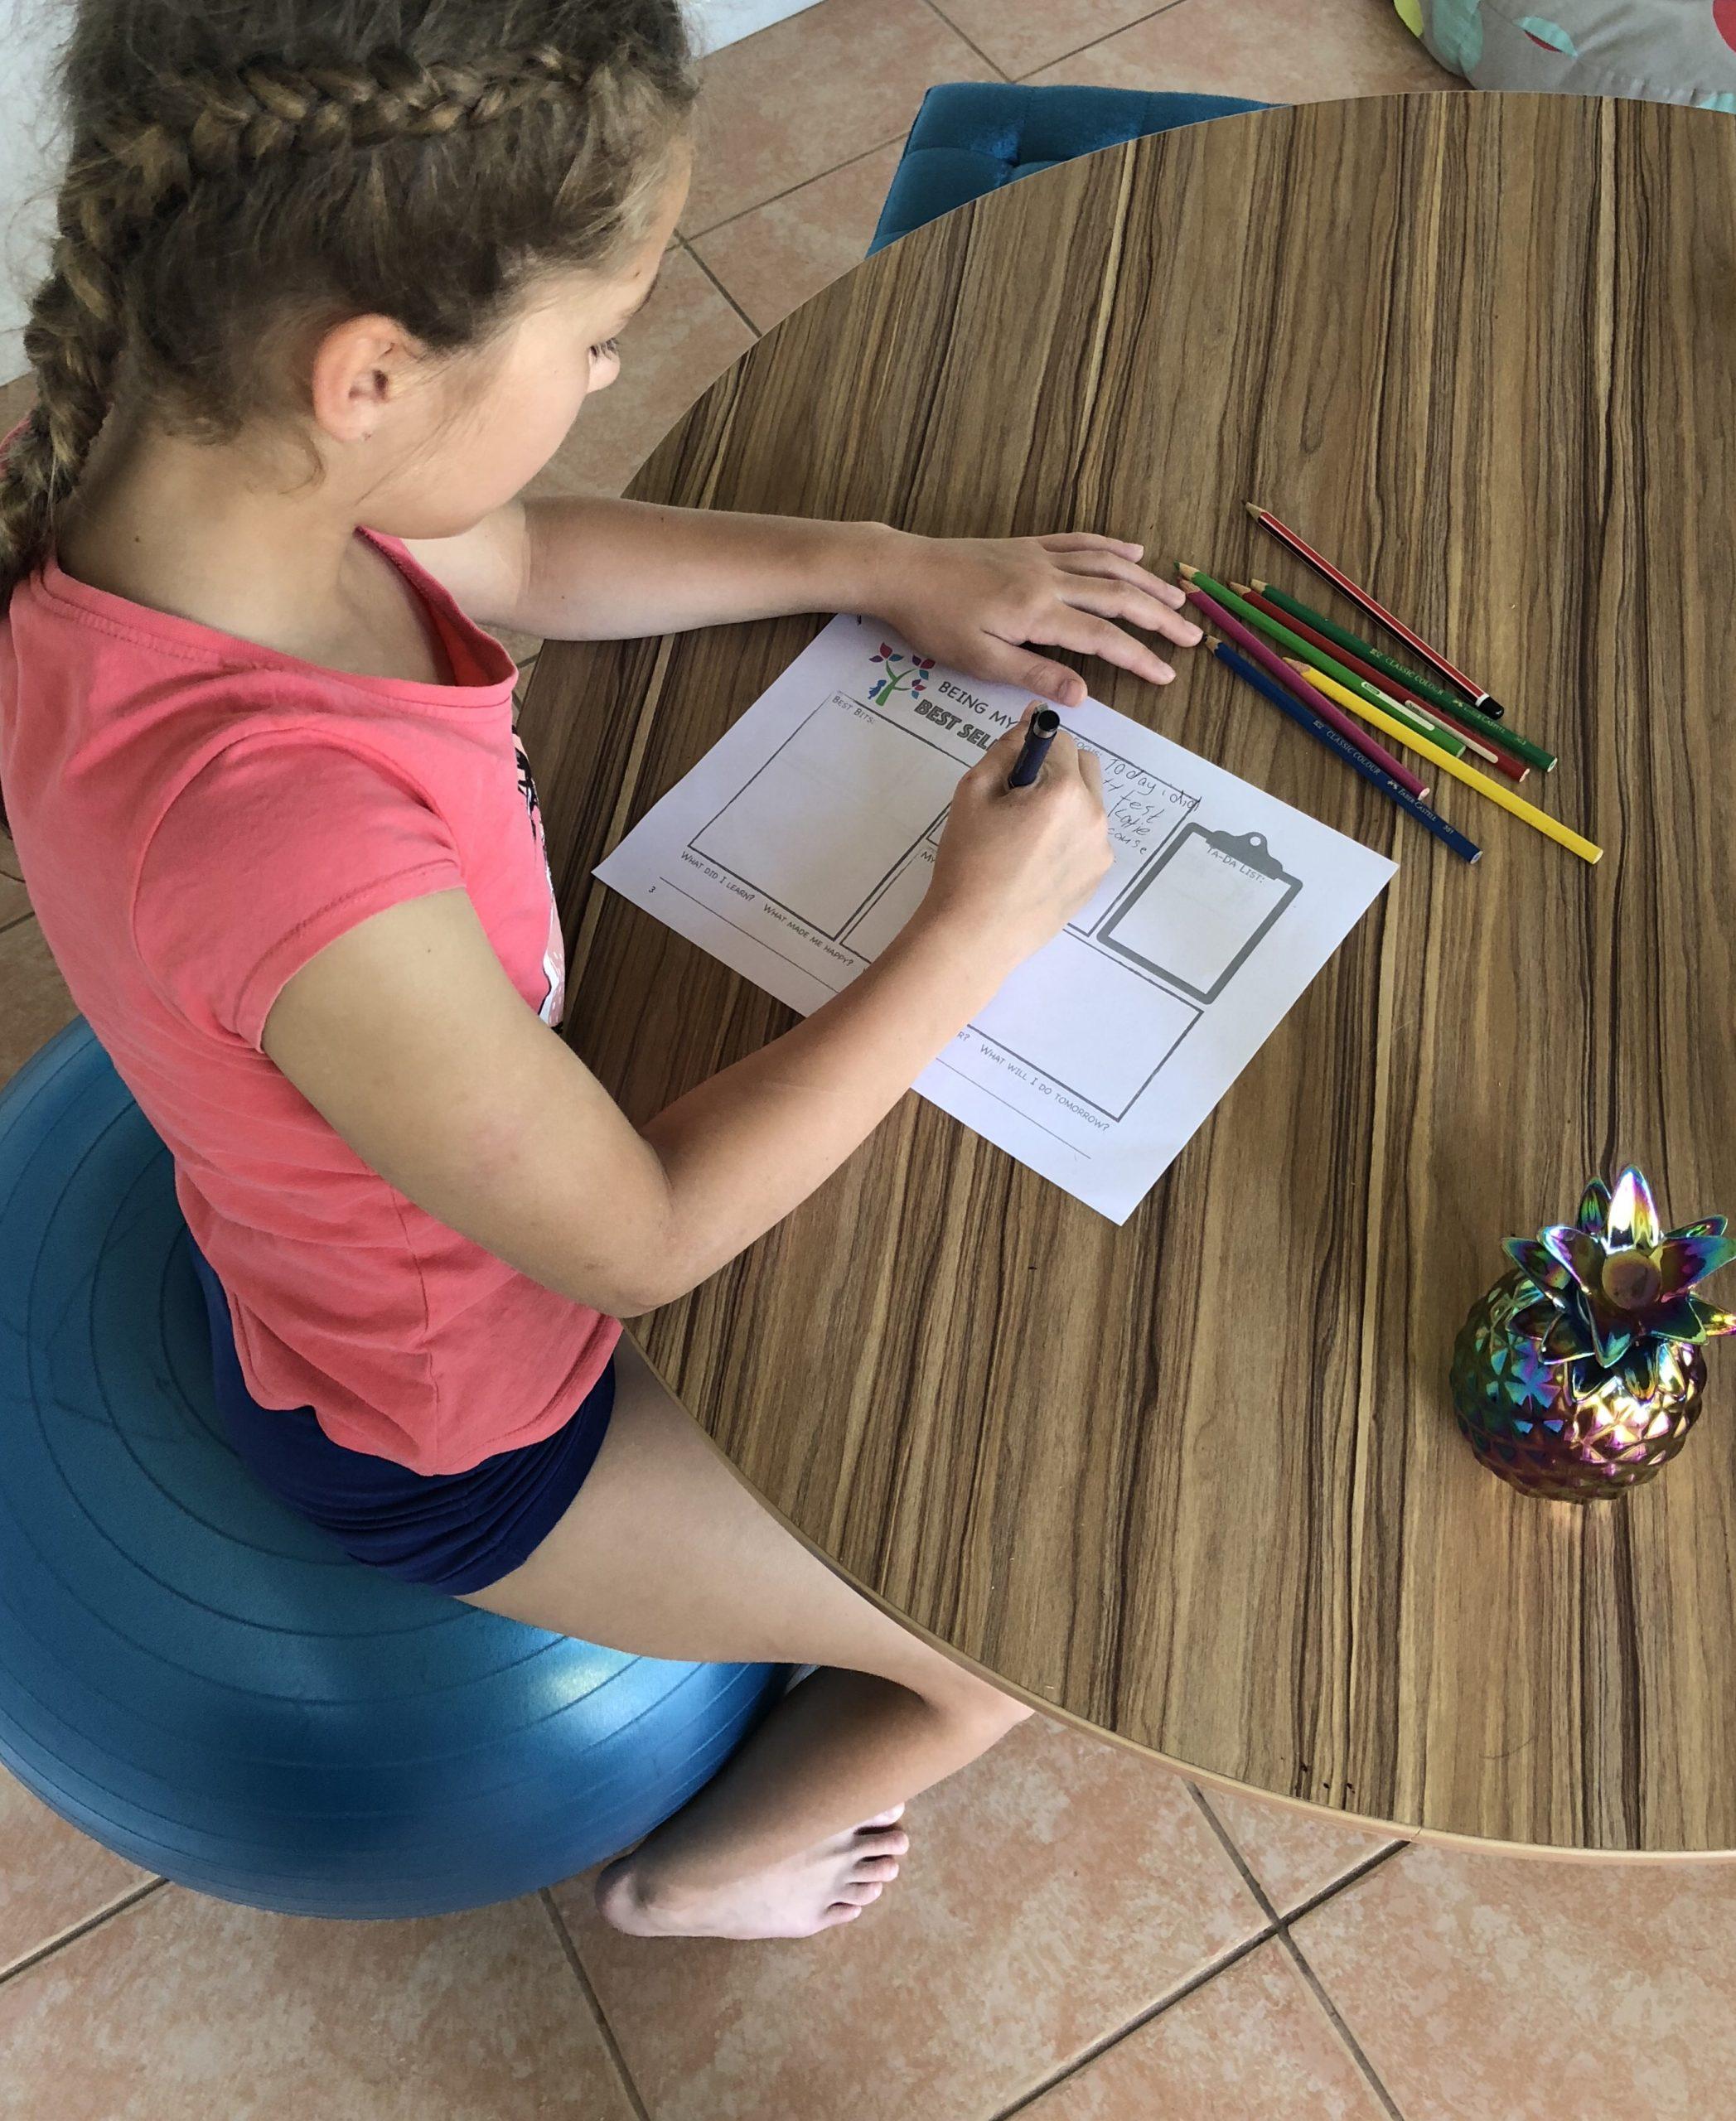 Mighty Me Kids 10 Week Program Guide Outline Downloadable